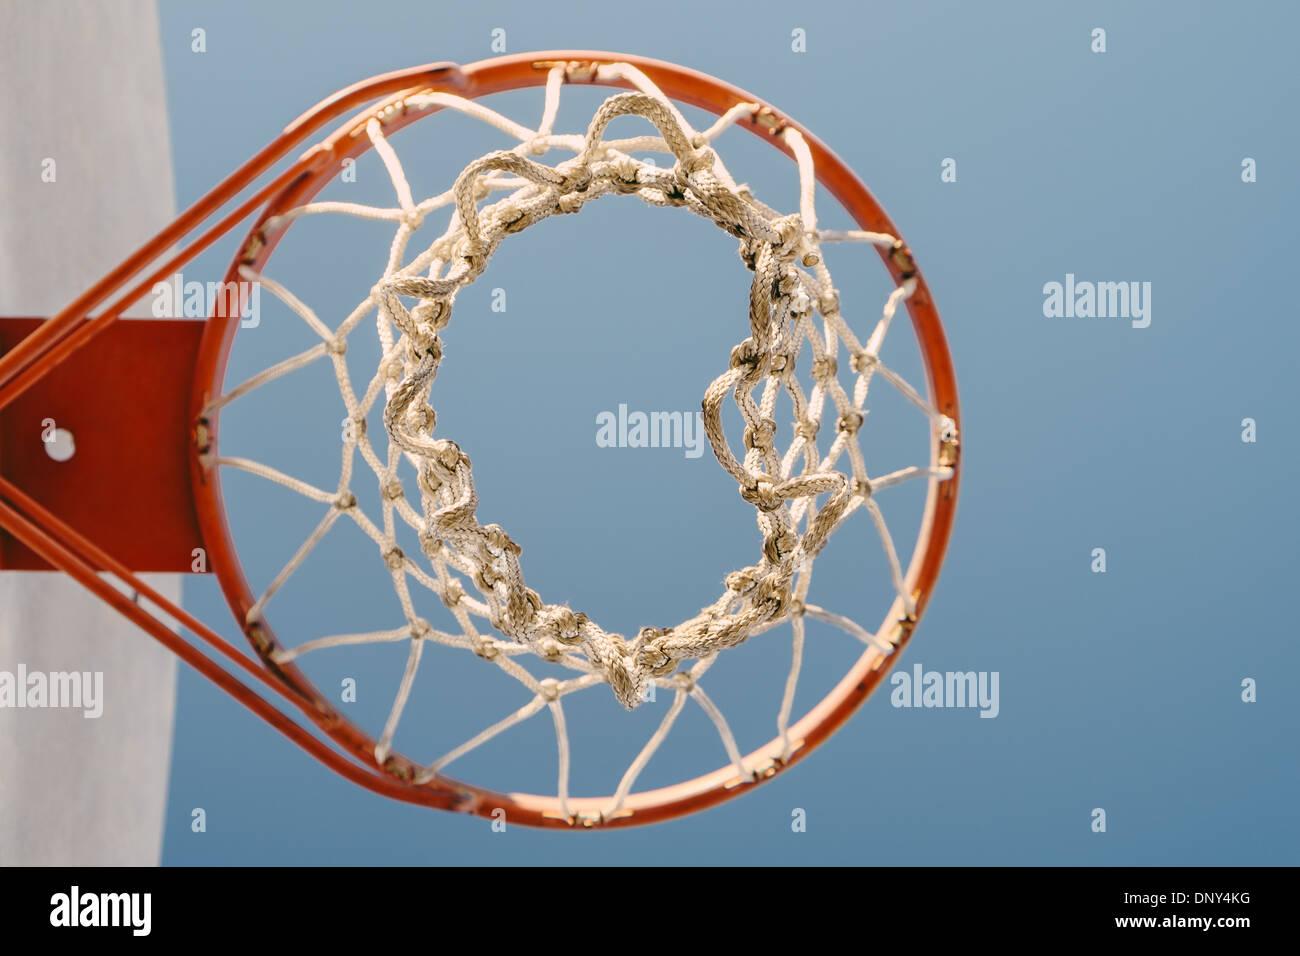 Basketball hoop against blue sky - Stock Image